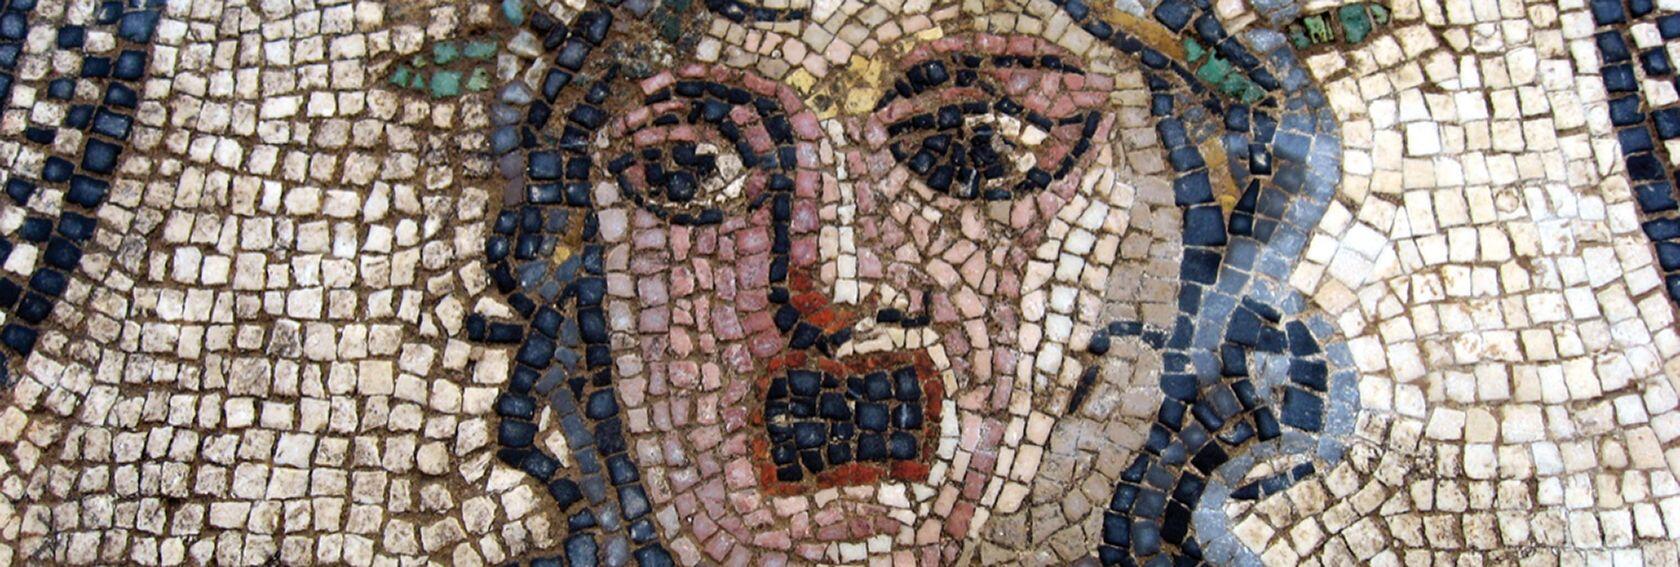 Musée de la Romanite Nimes mosaic.